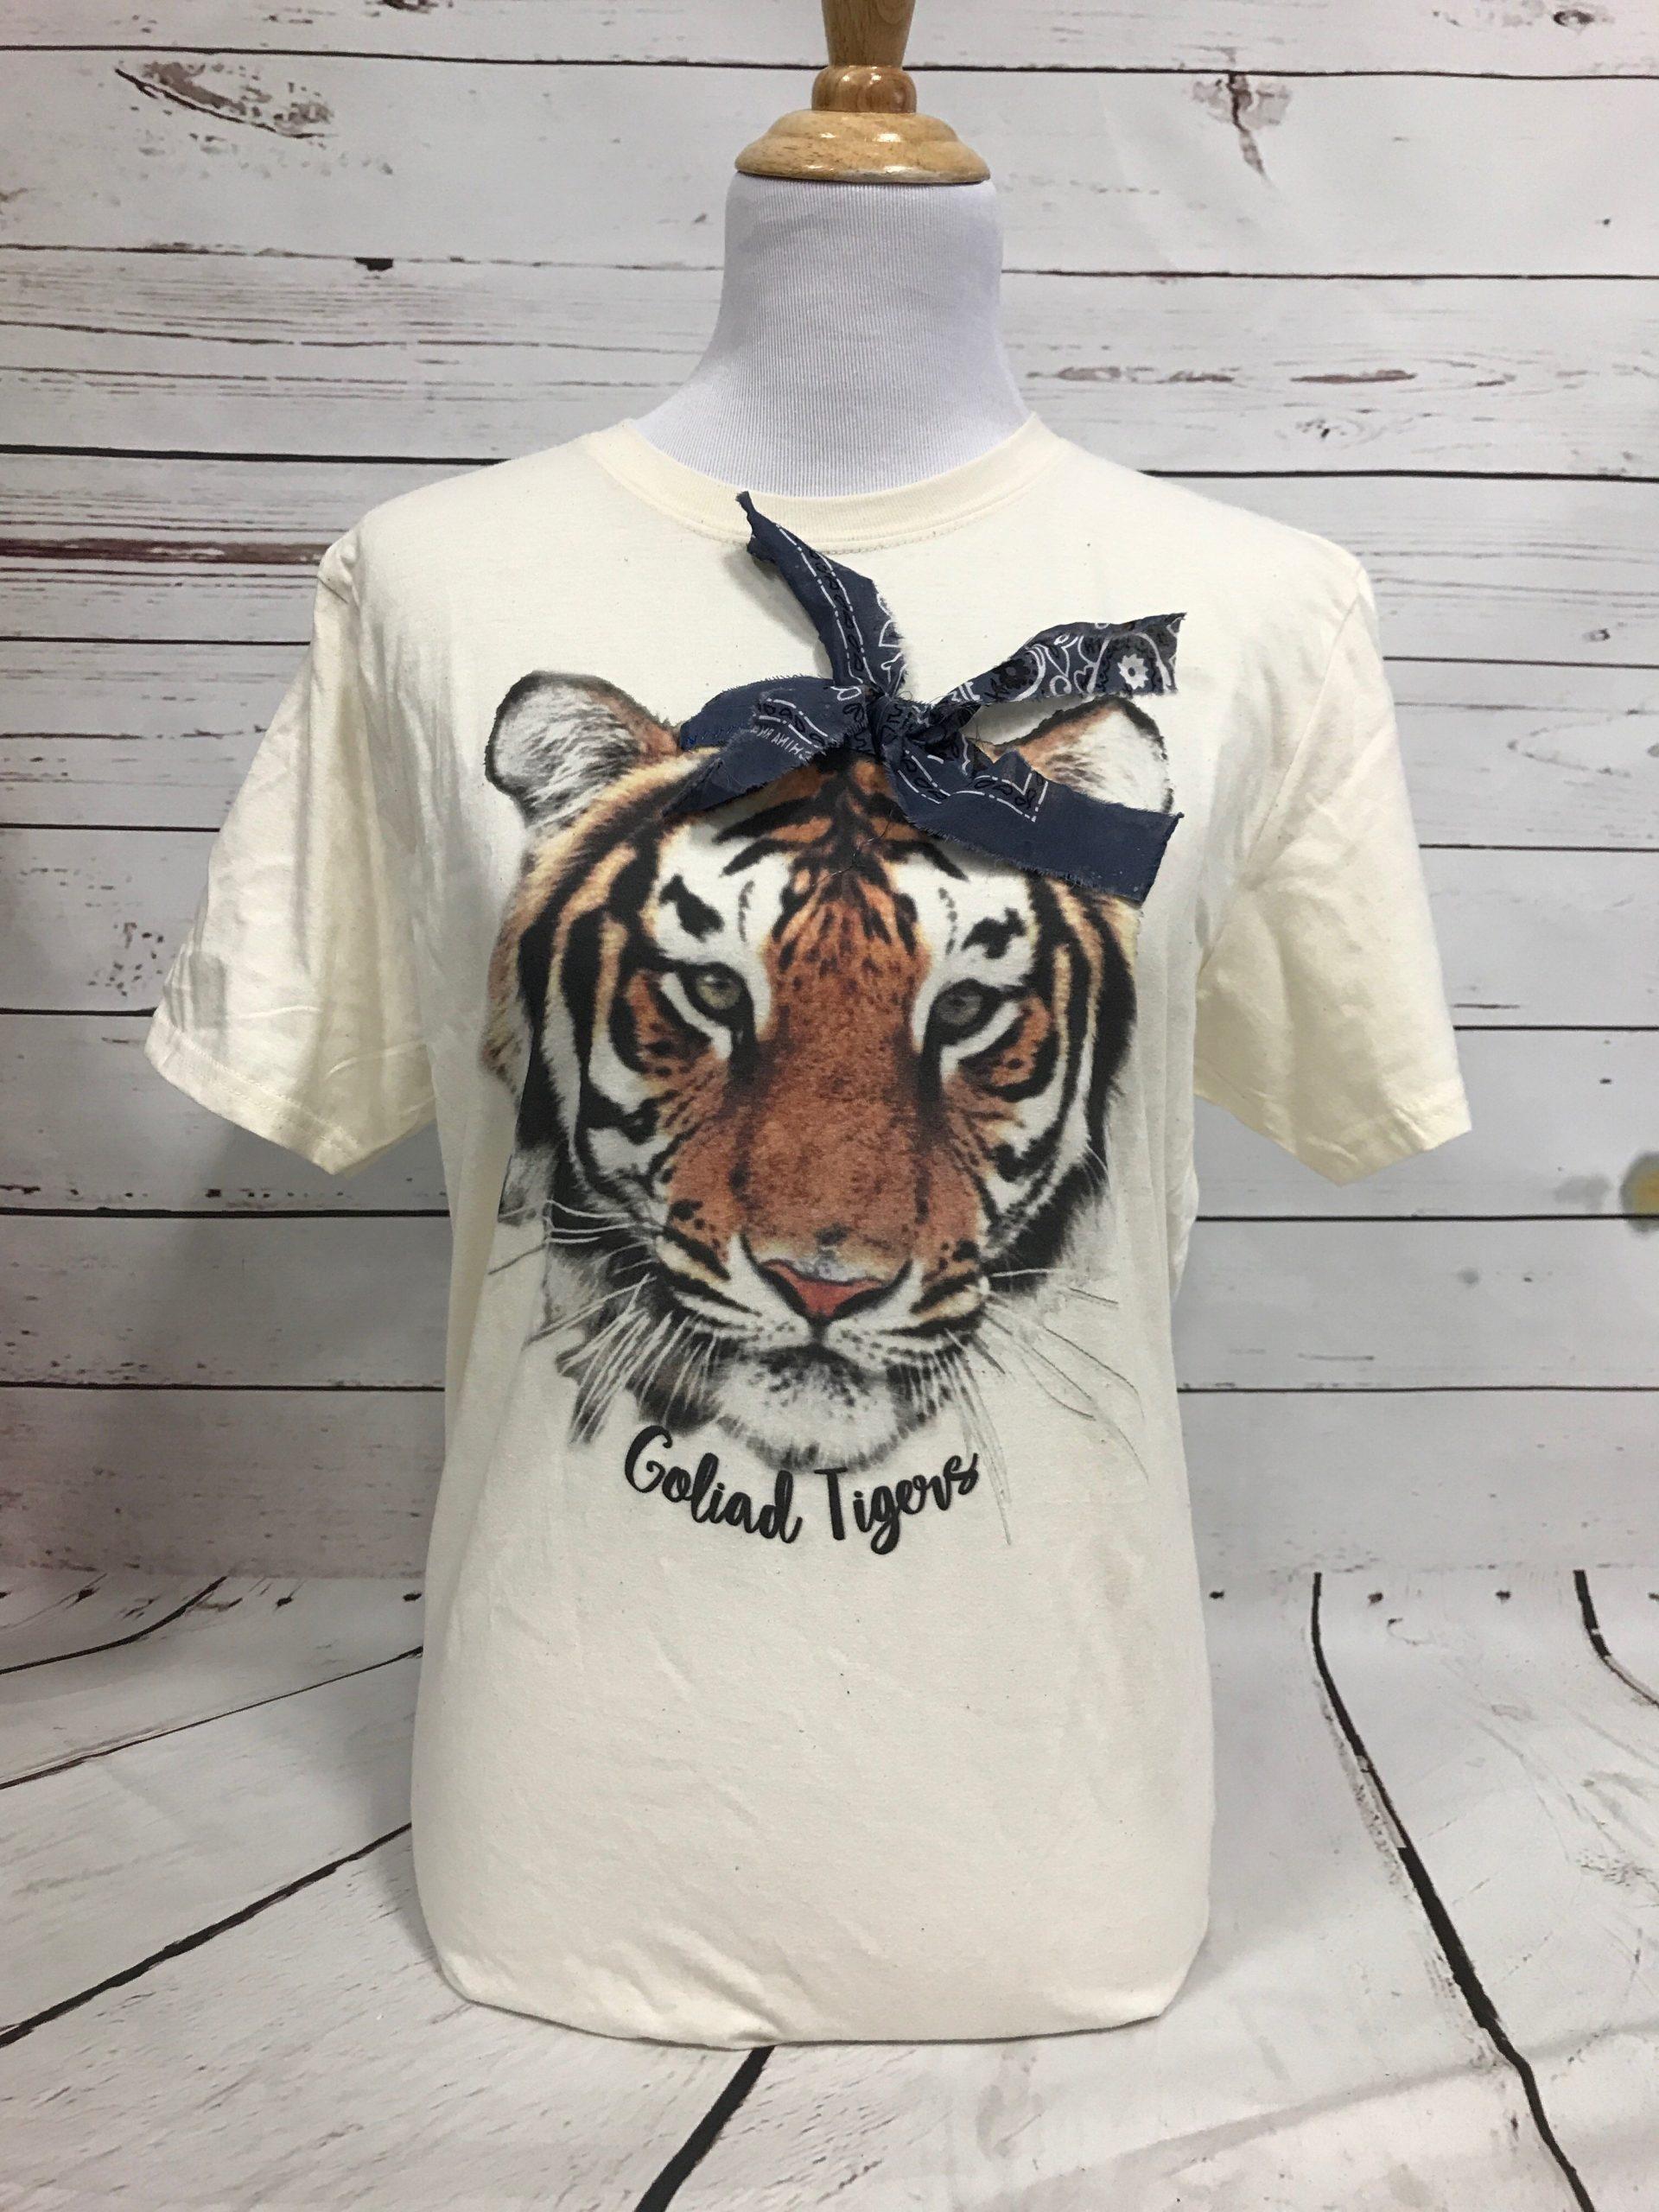 Tigers Mascot with Black Bandana on Cream Tultex Tee